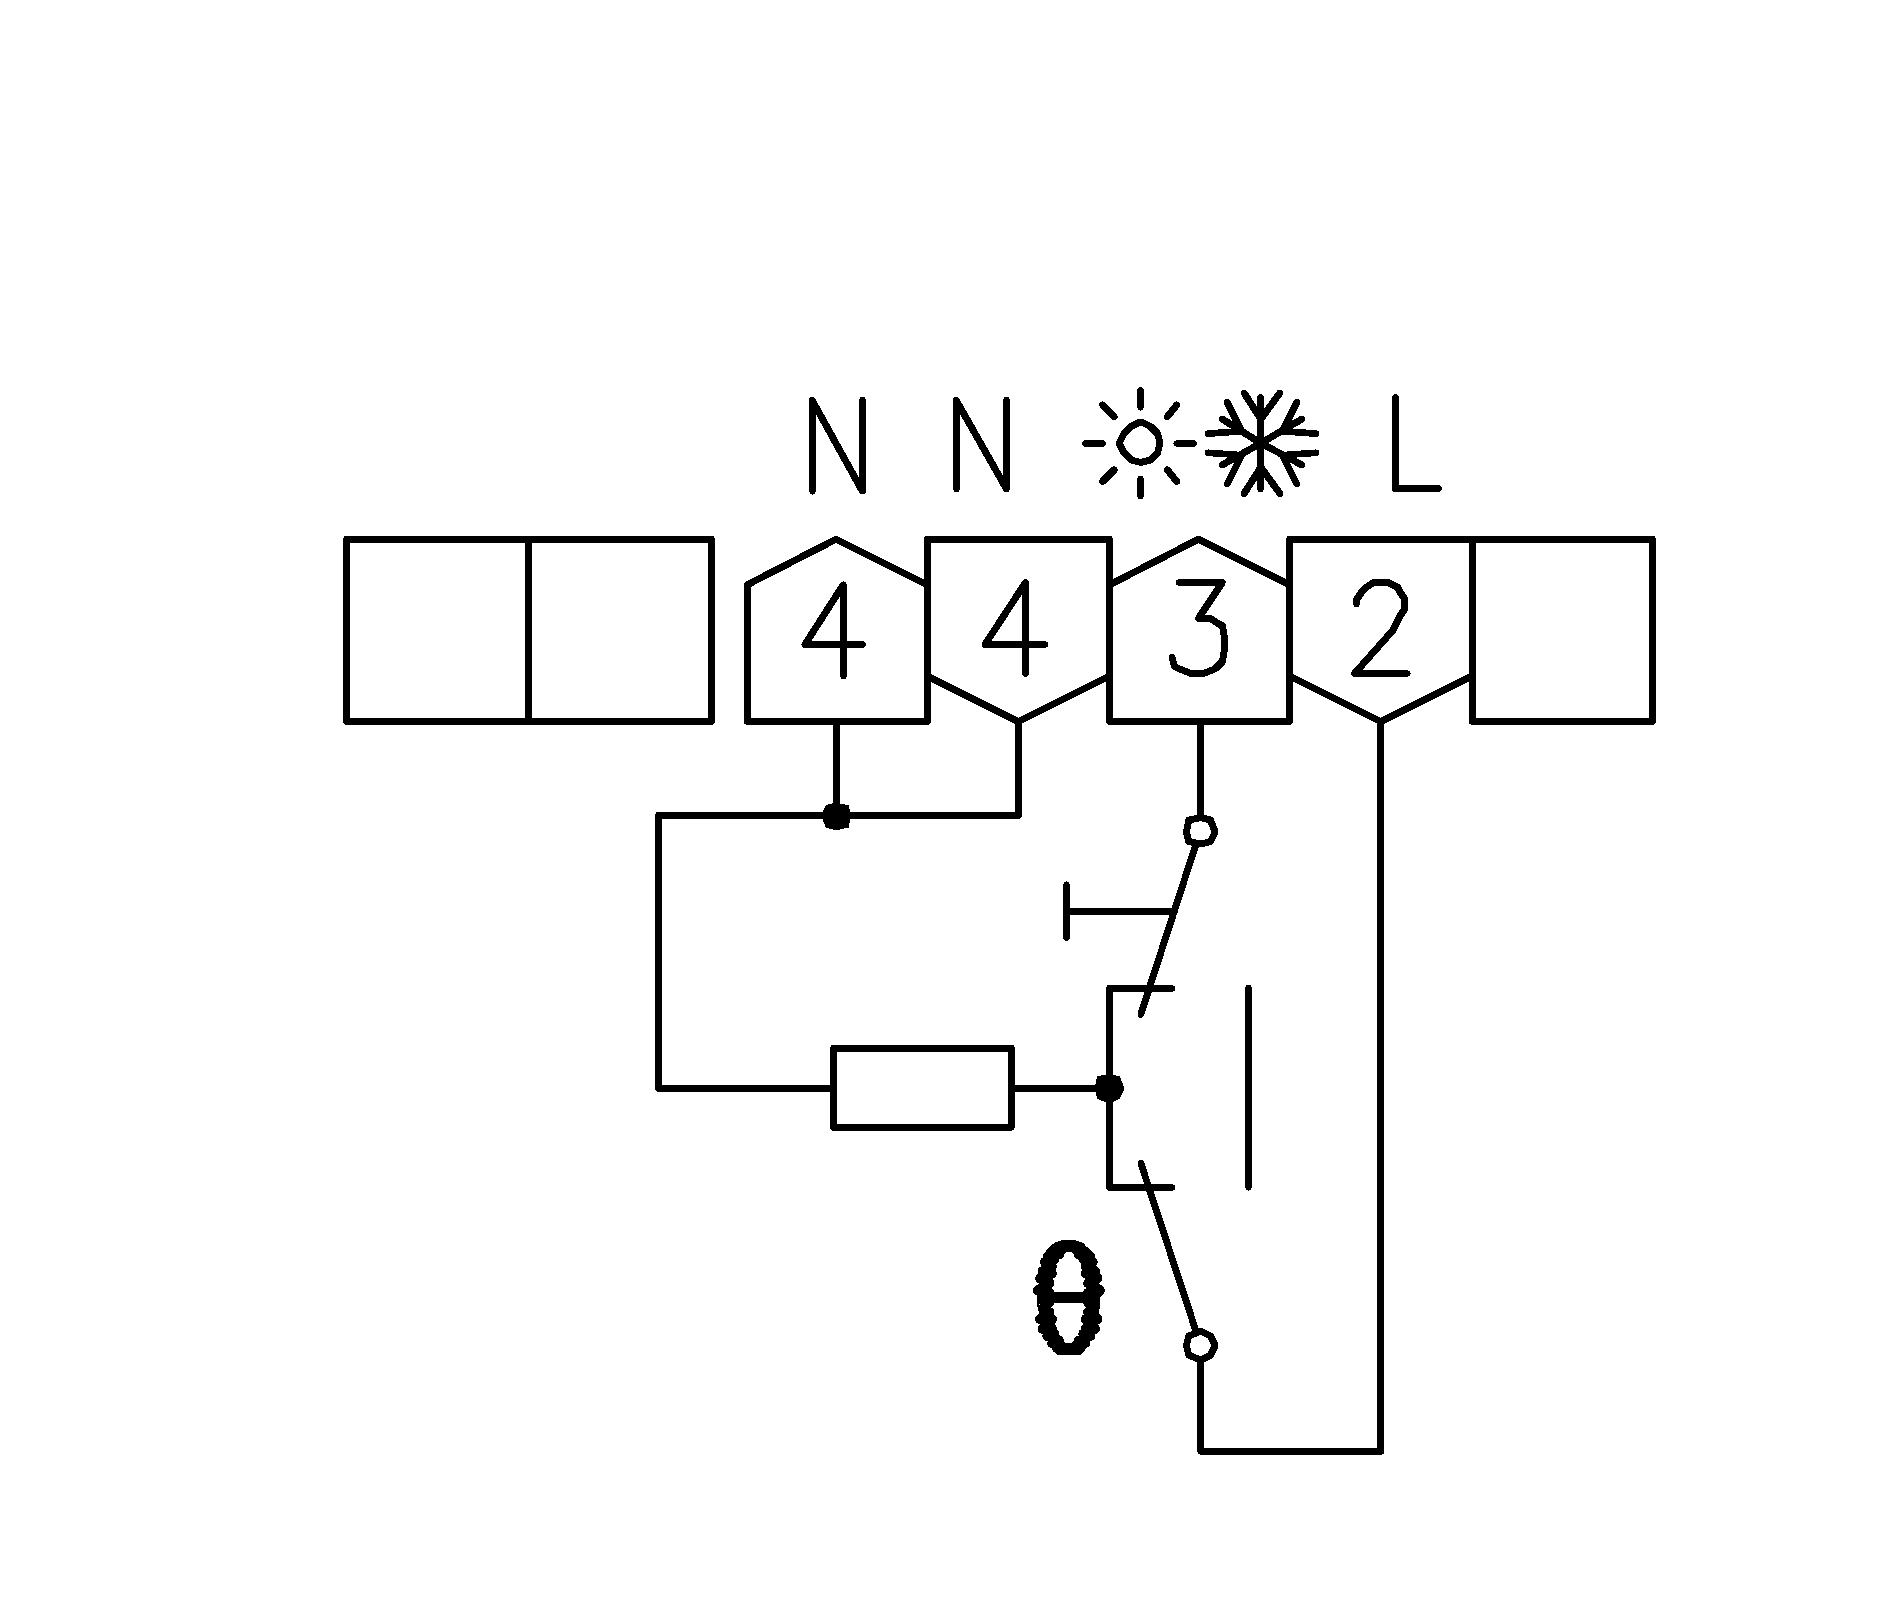 MA010600 Circuit diagram